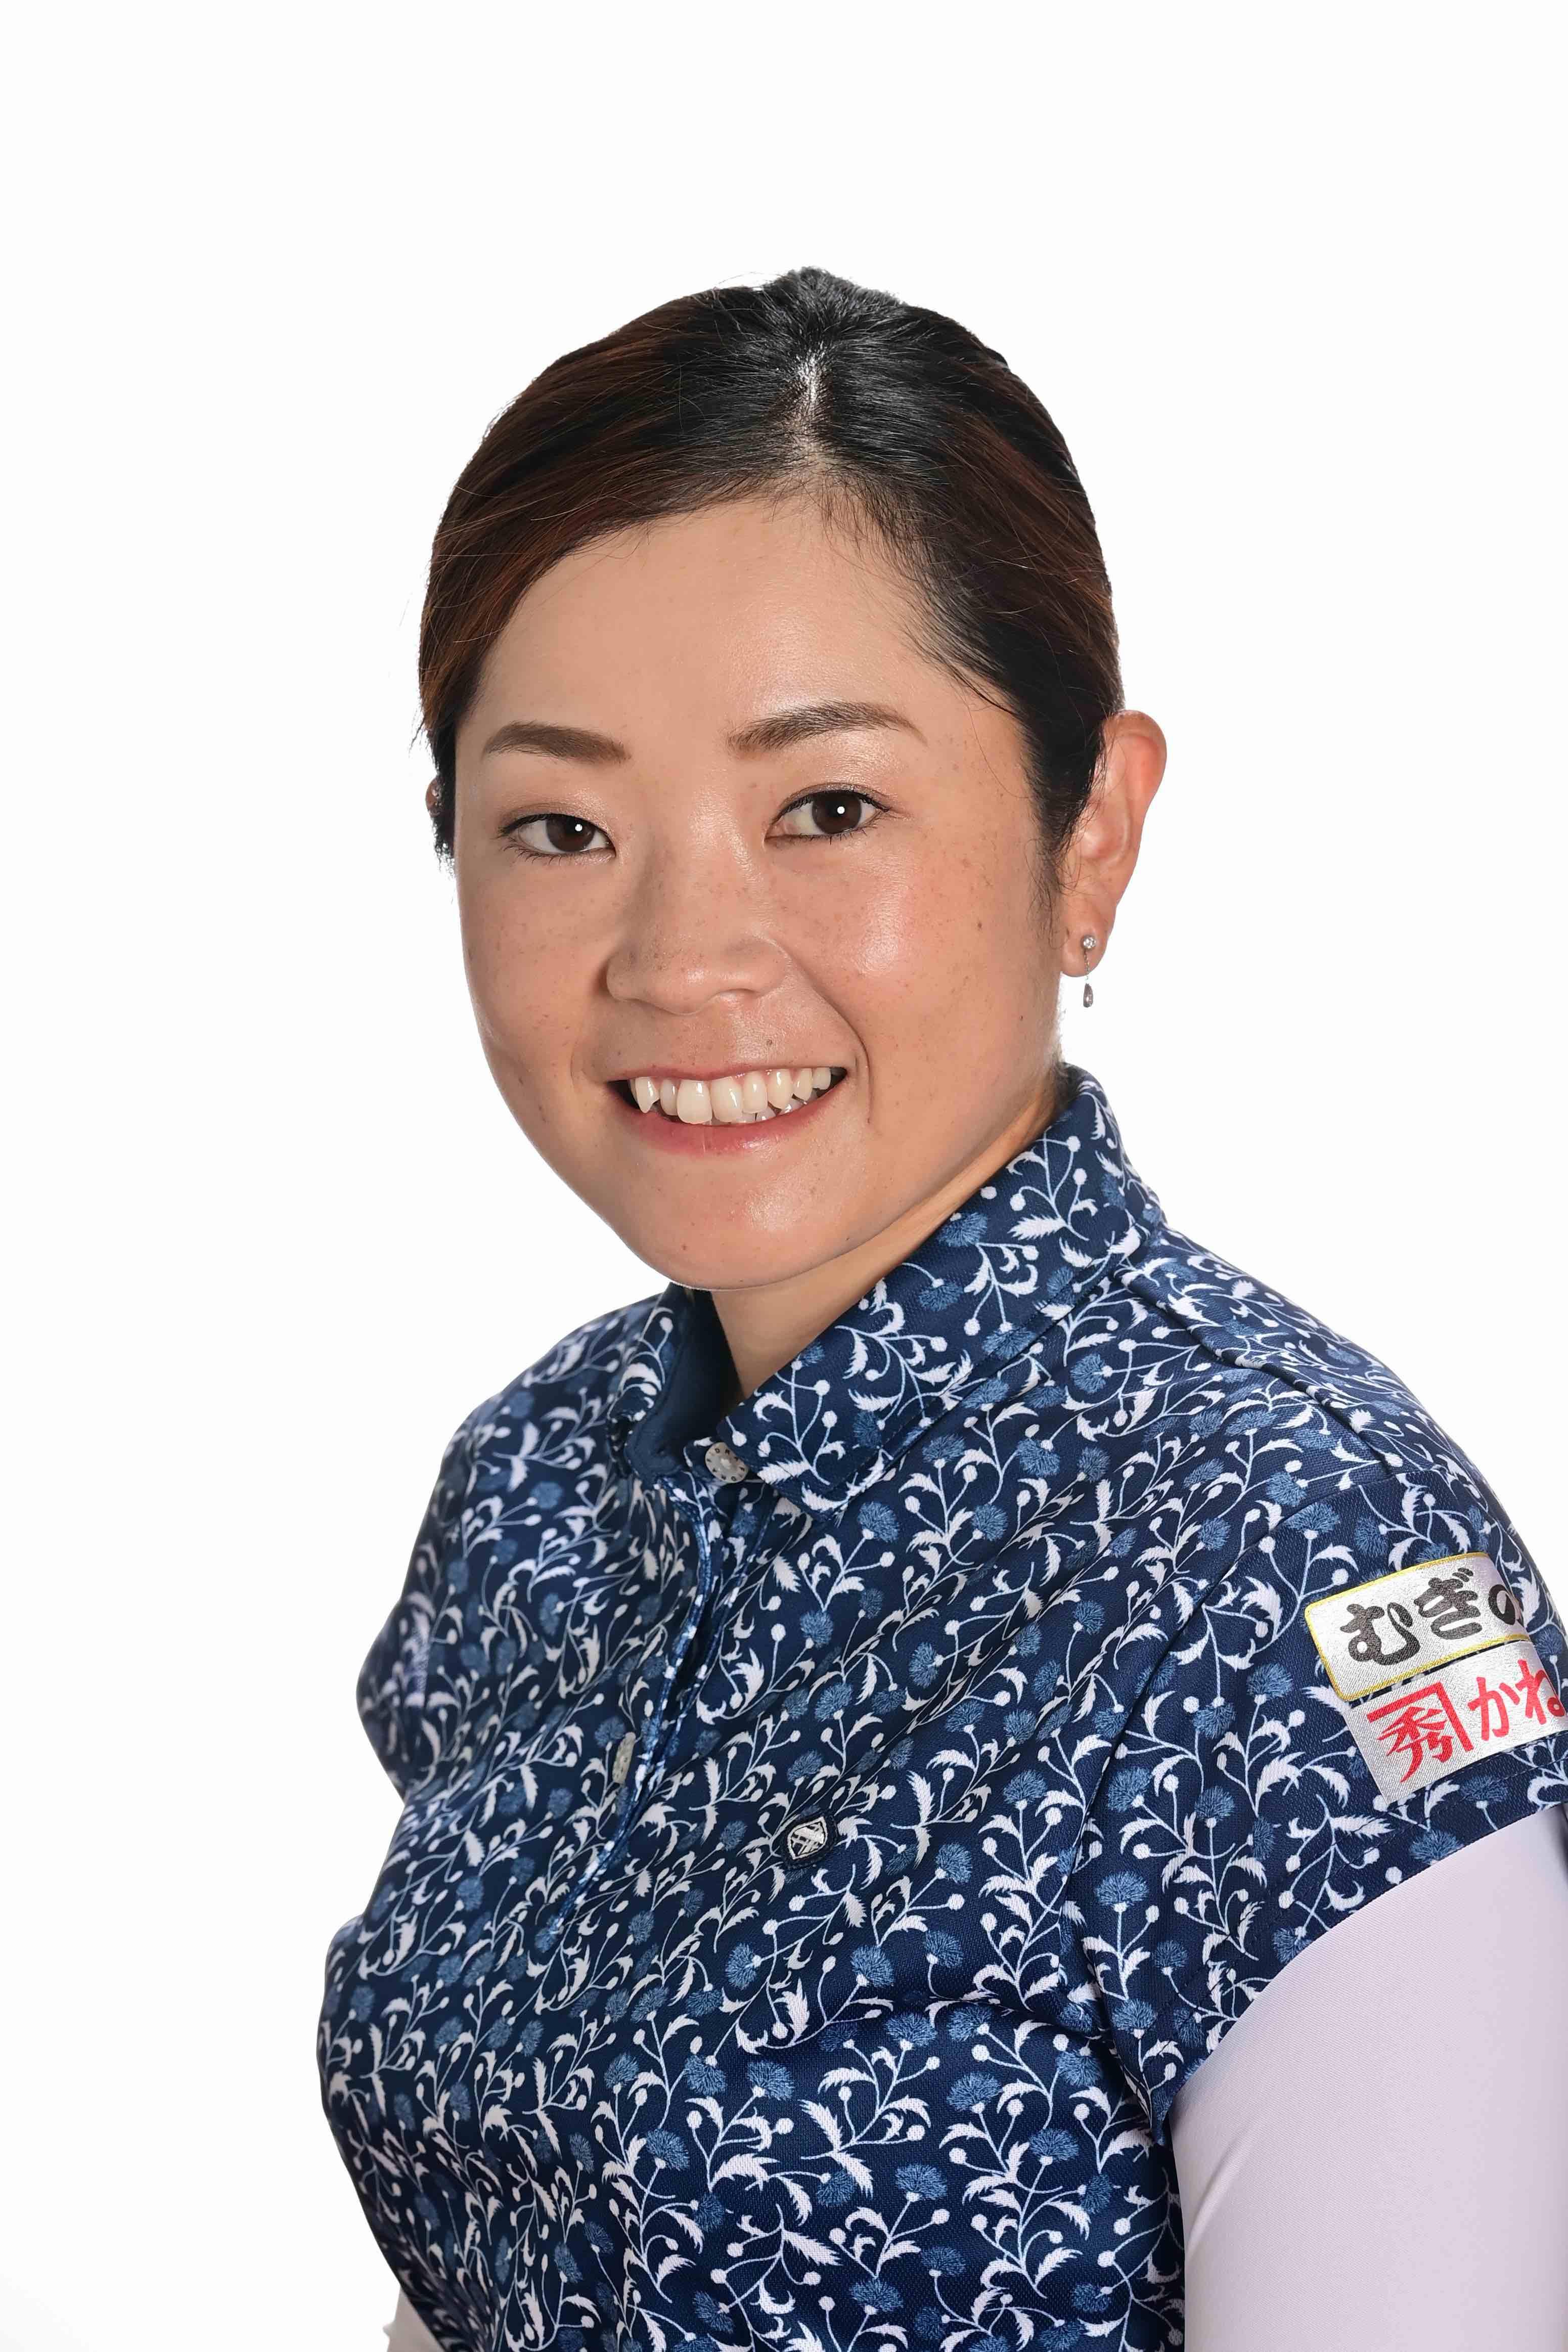 【JLPGA公式】仲宗根 澄香 選手(ゴルフボール1スリーブ④)